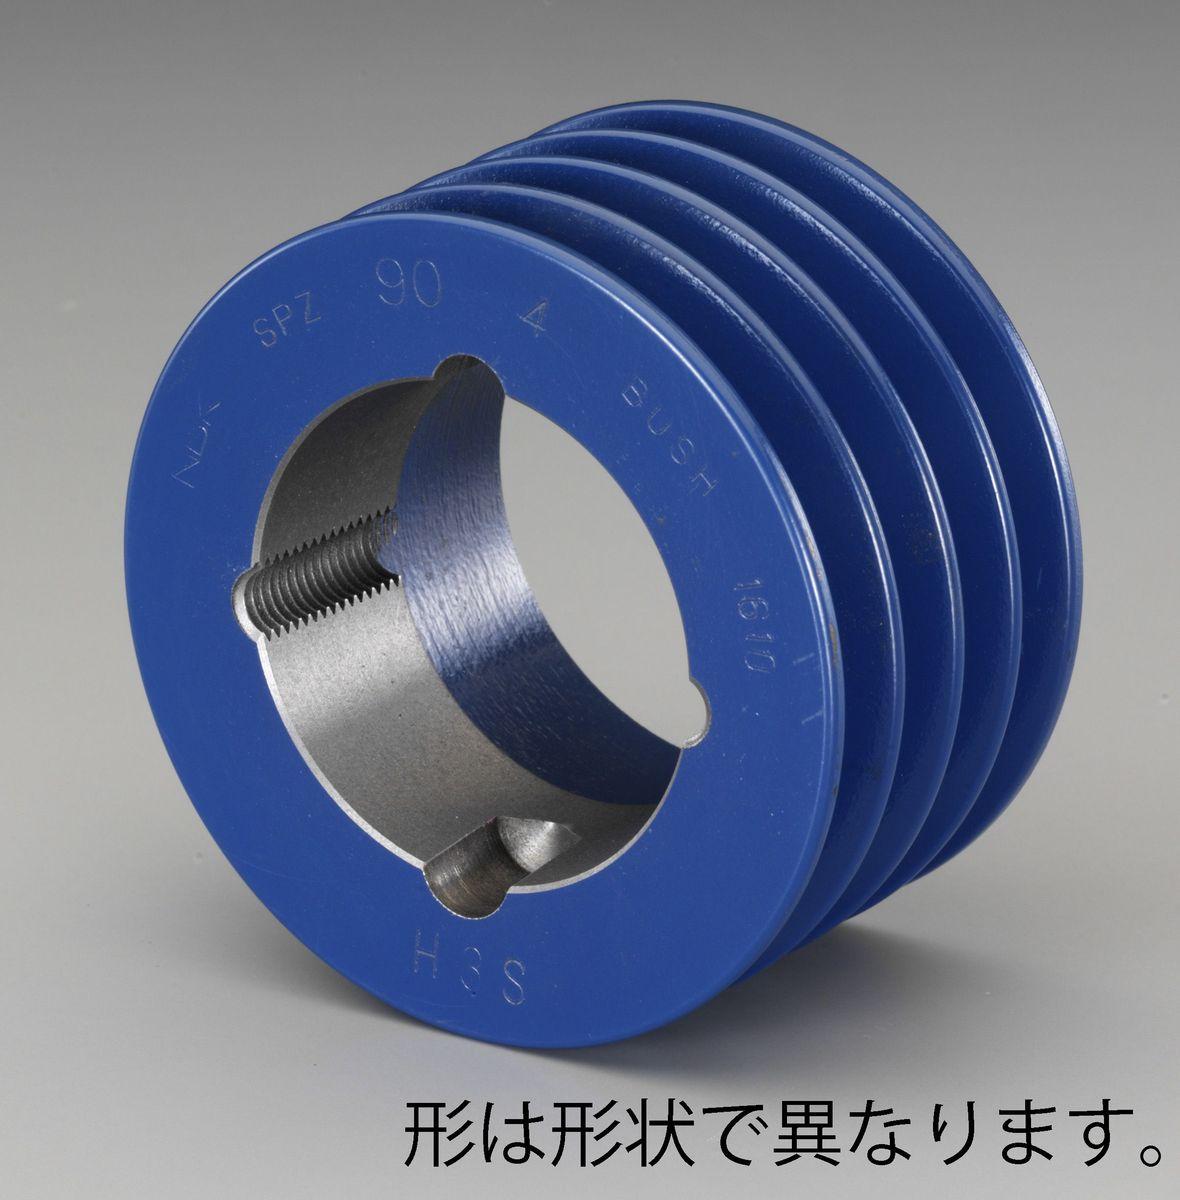 エスコ ESCO 230mm 4本構 Vプーリー SPプーリー/41U 000012266159 HD店